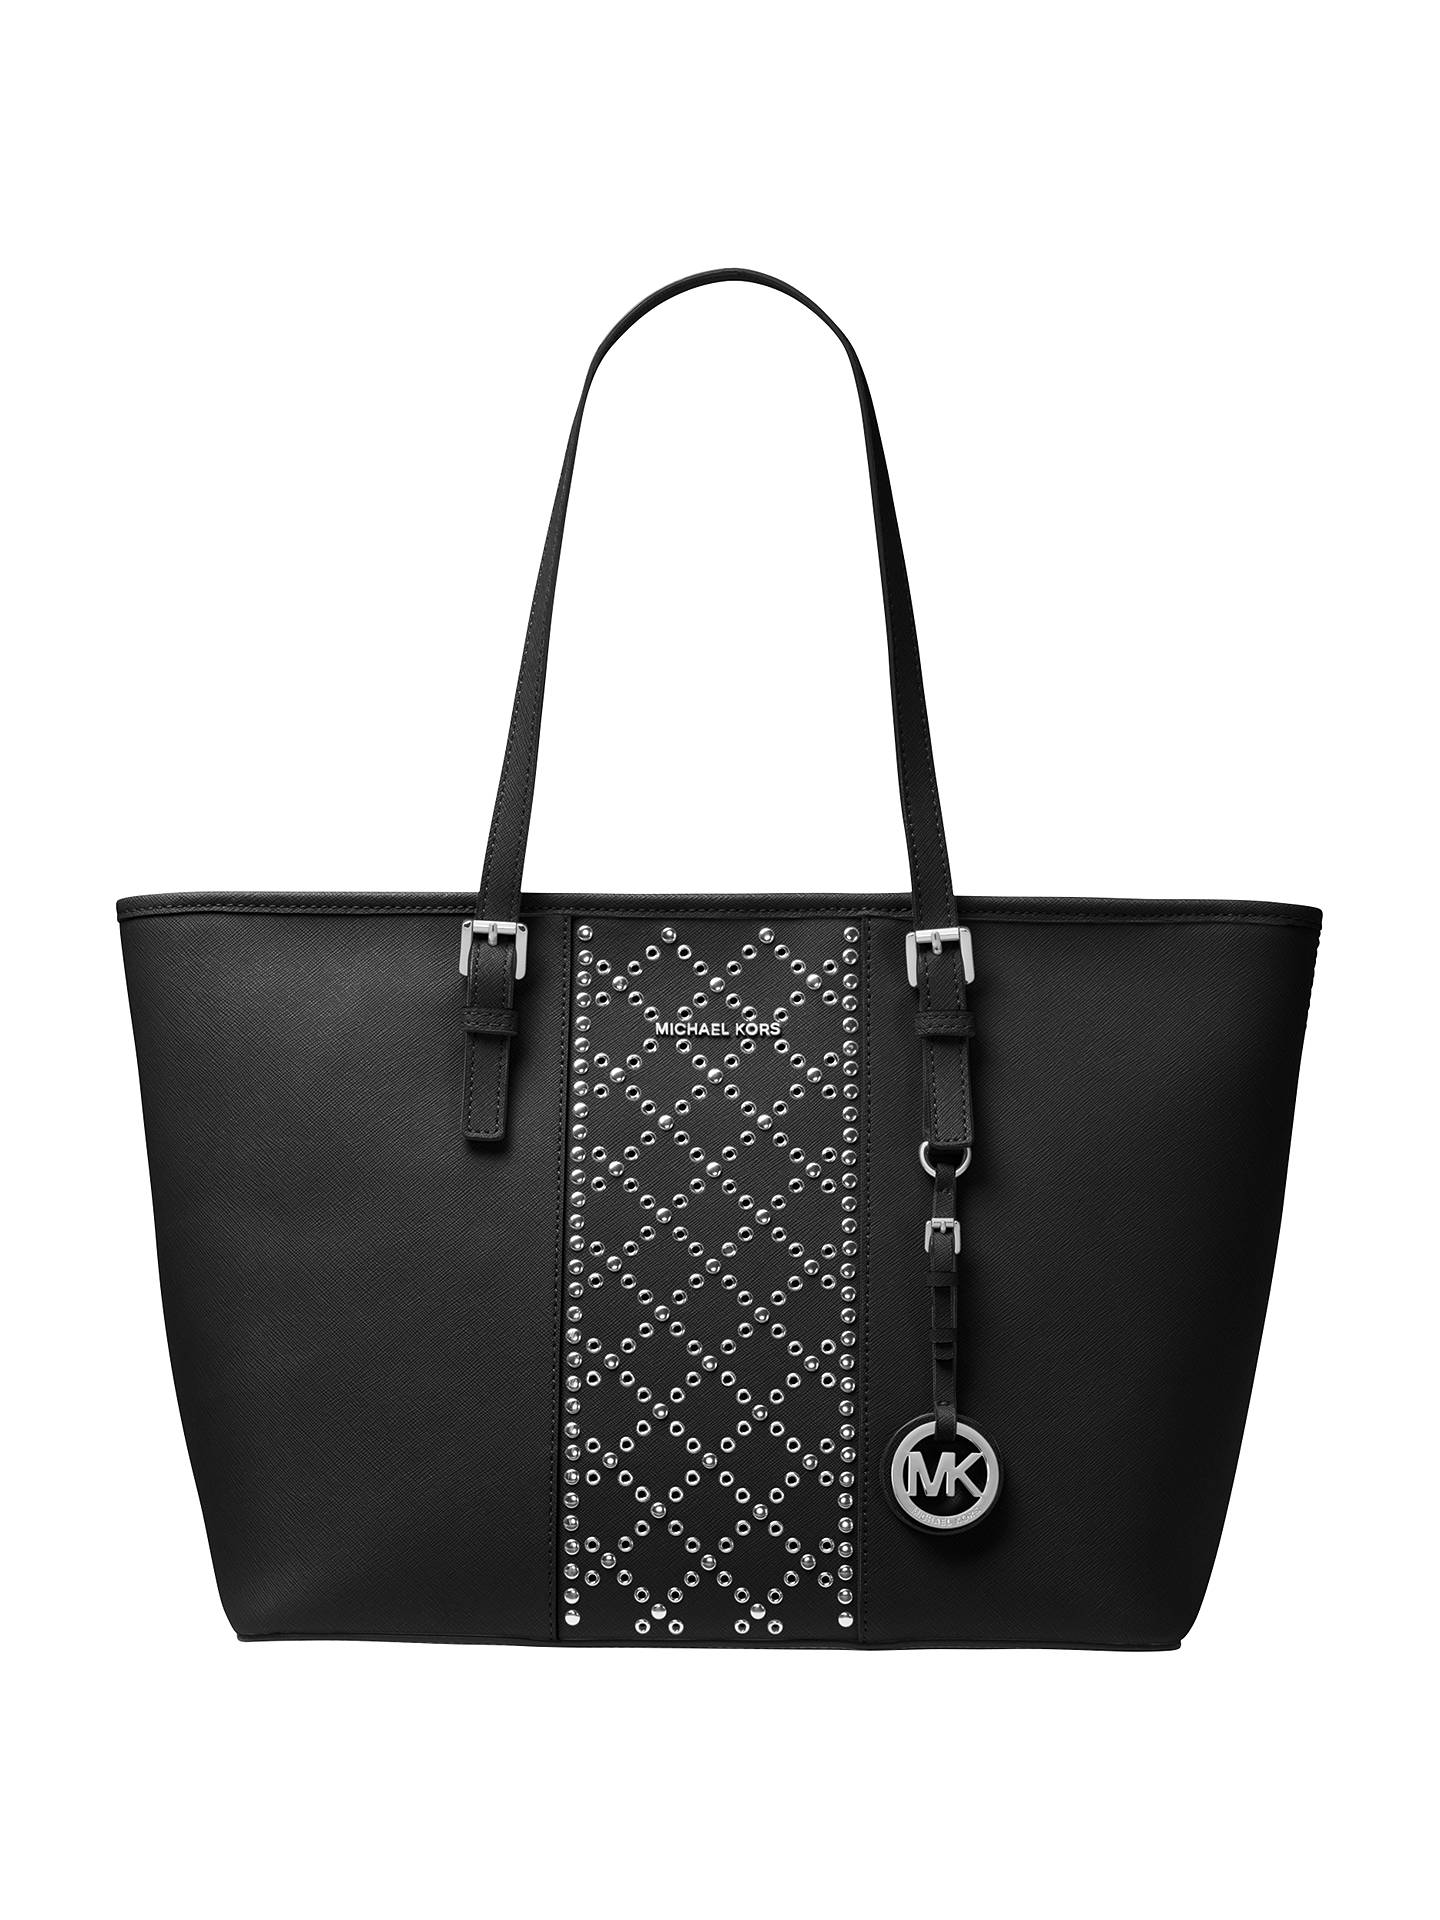 a8ac05eb898b19 Buy MICHAEL Michael Kors Jet Set Travel Large Leather Stud Tote Bag, Black  Online at ...